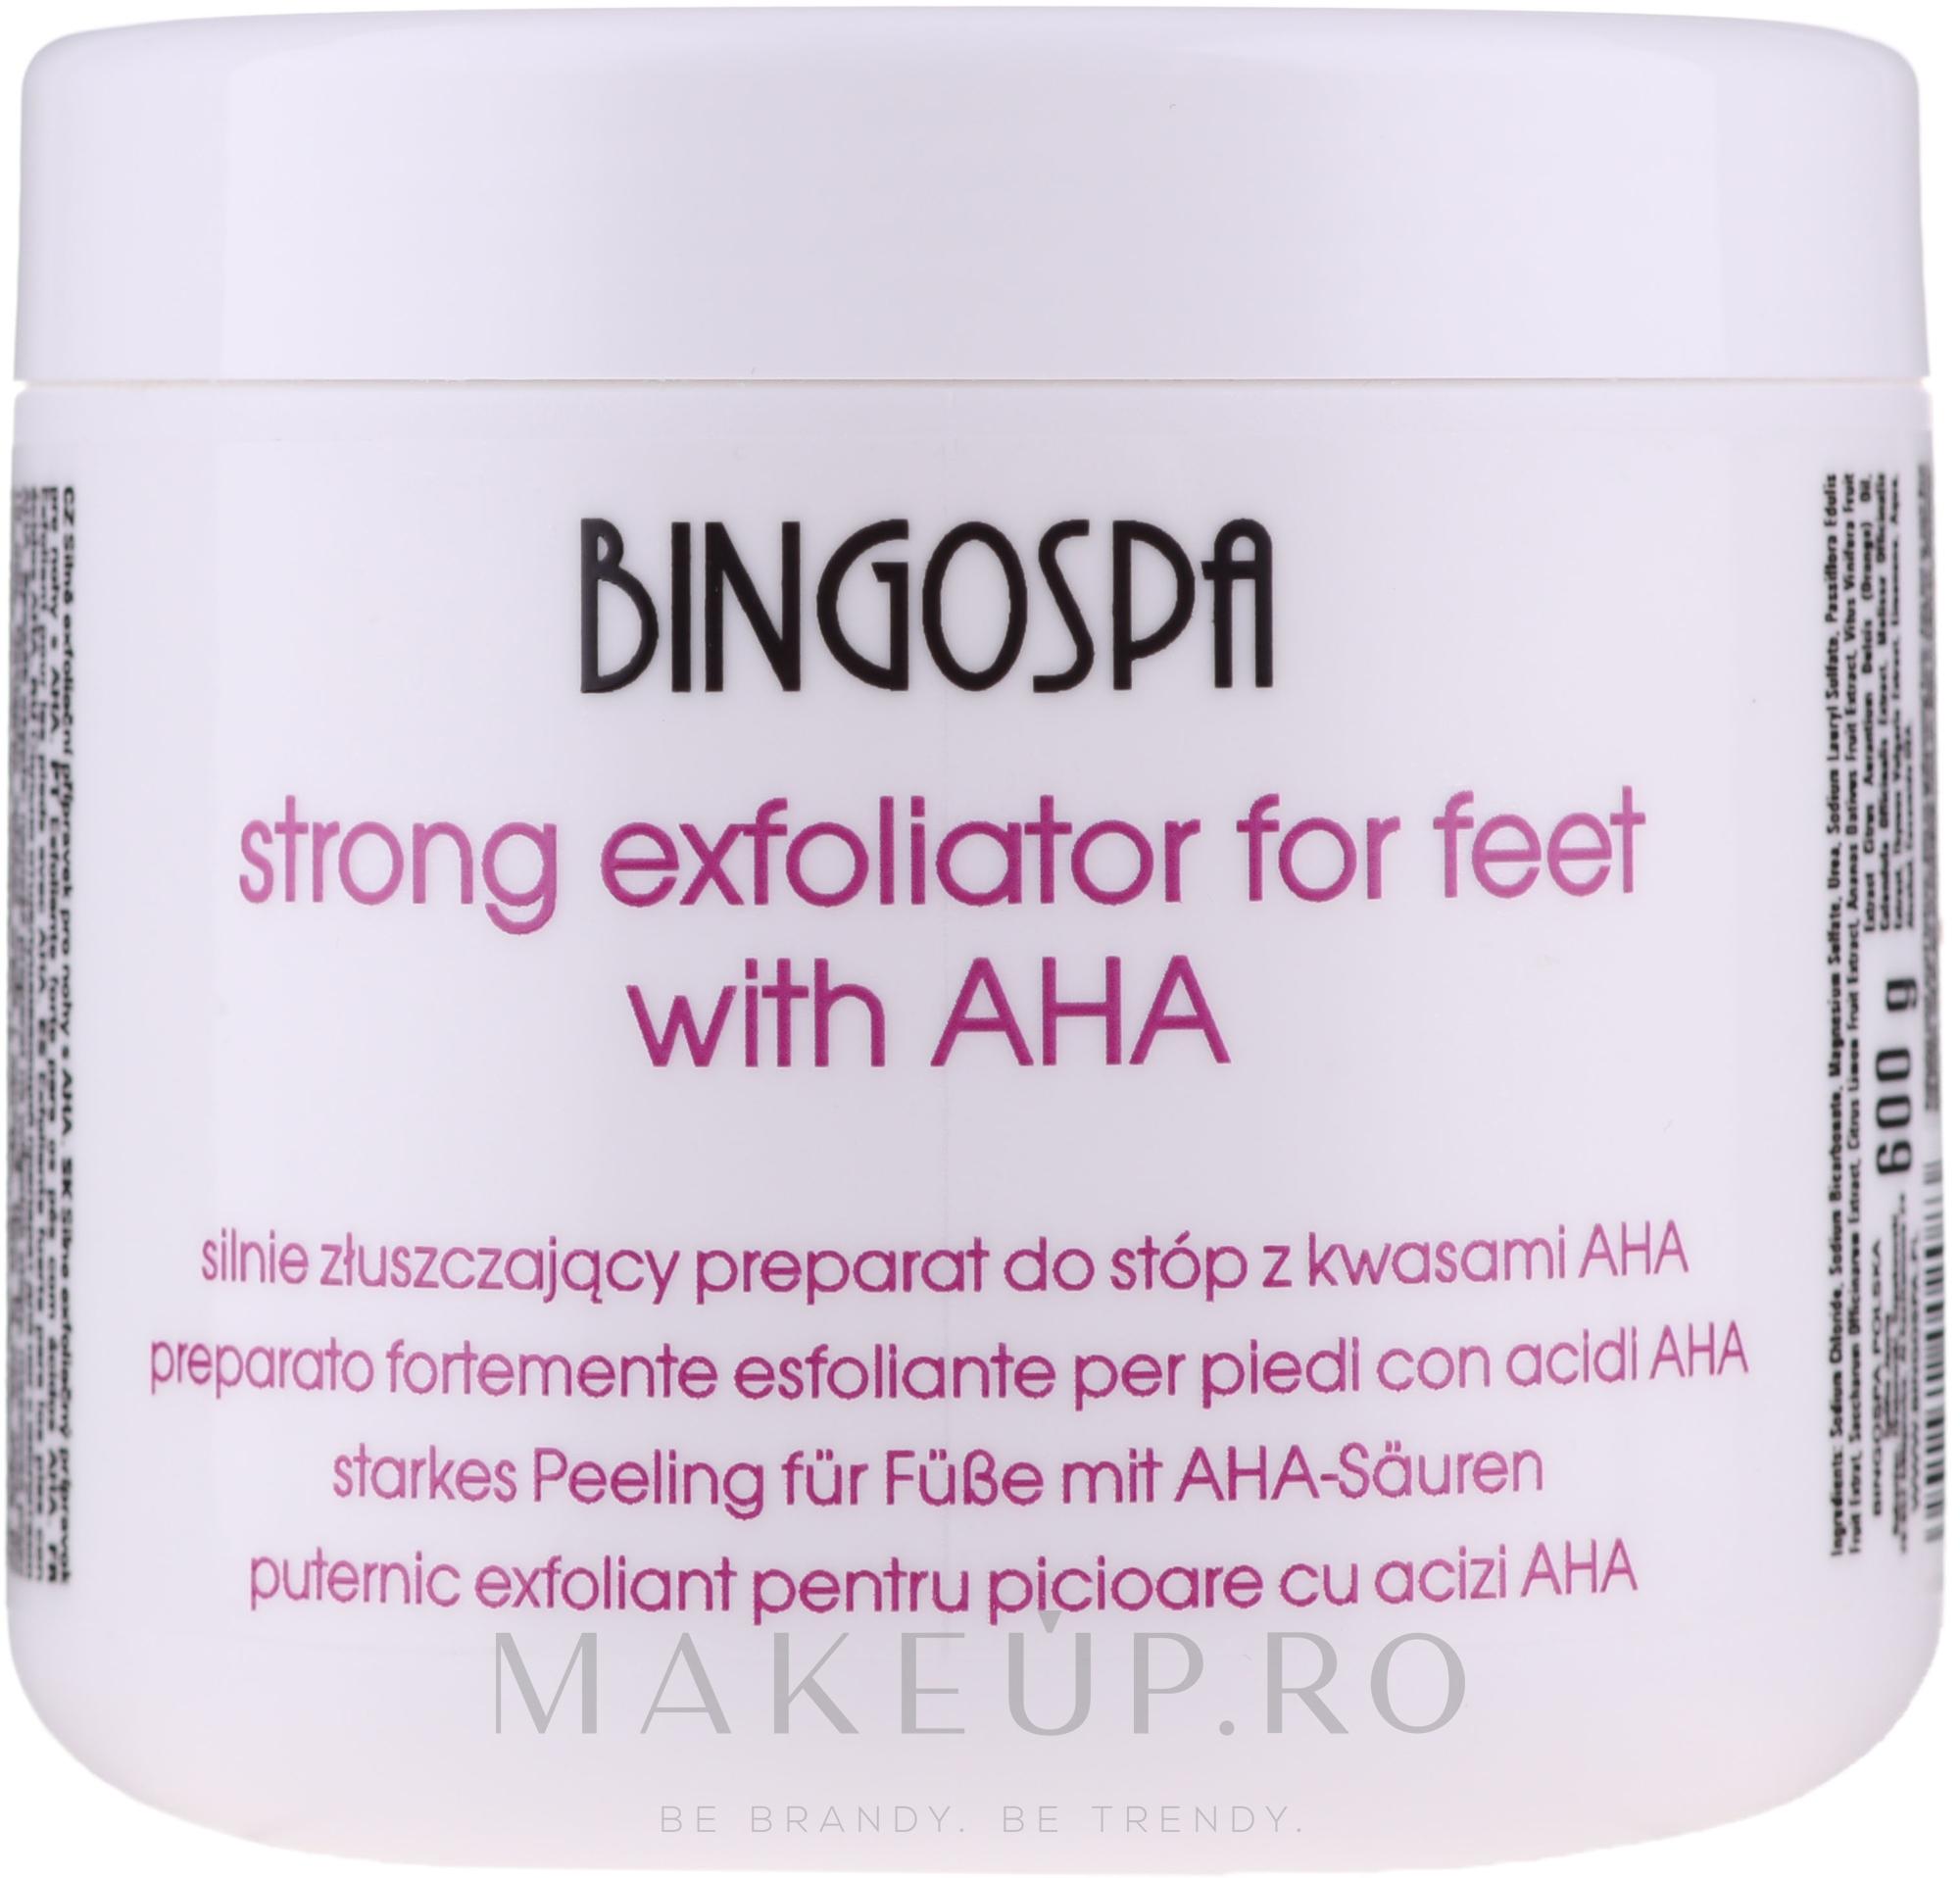 Exfoliant pentru picioare - BingoSpa Strong Exfoliant for Feet with AHA — фото 600 g